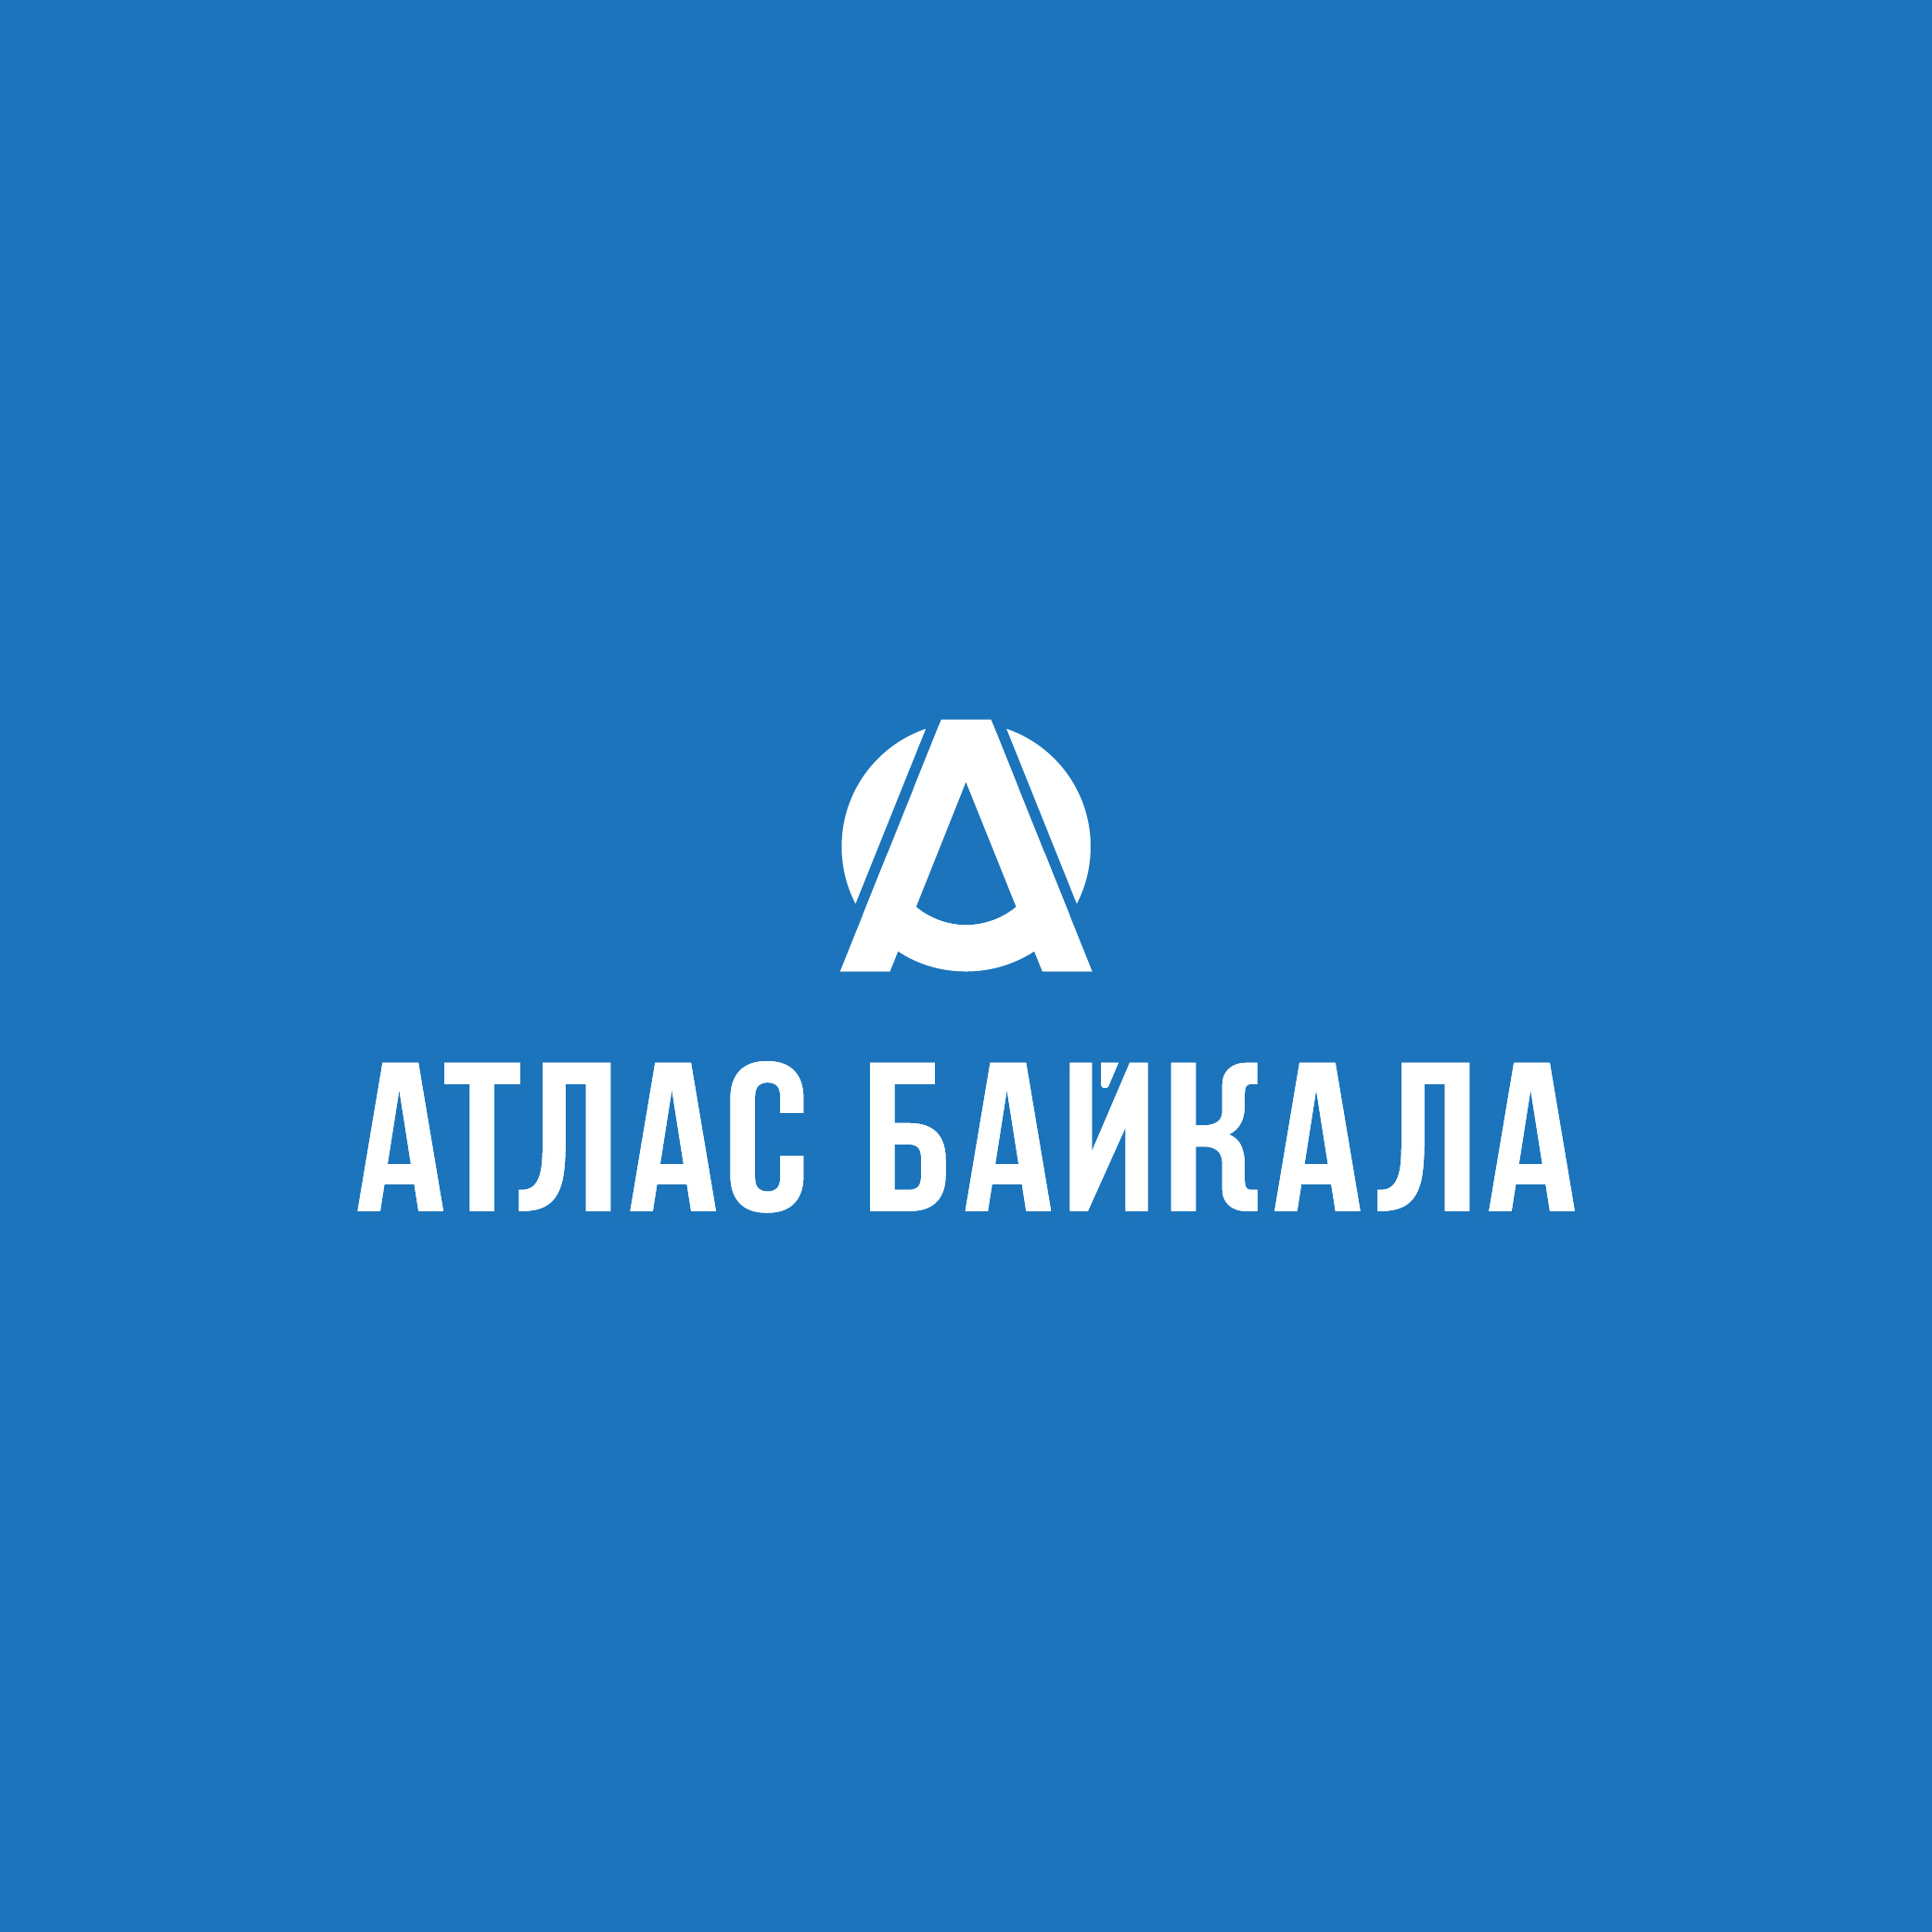 Разработка логотипа Атлас Байкала фото f_0655afc8d8275e46.jpg